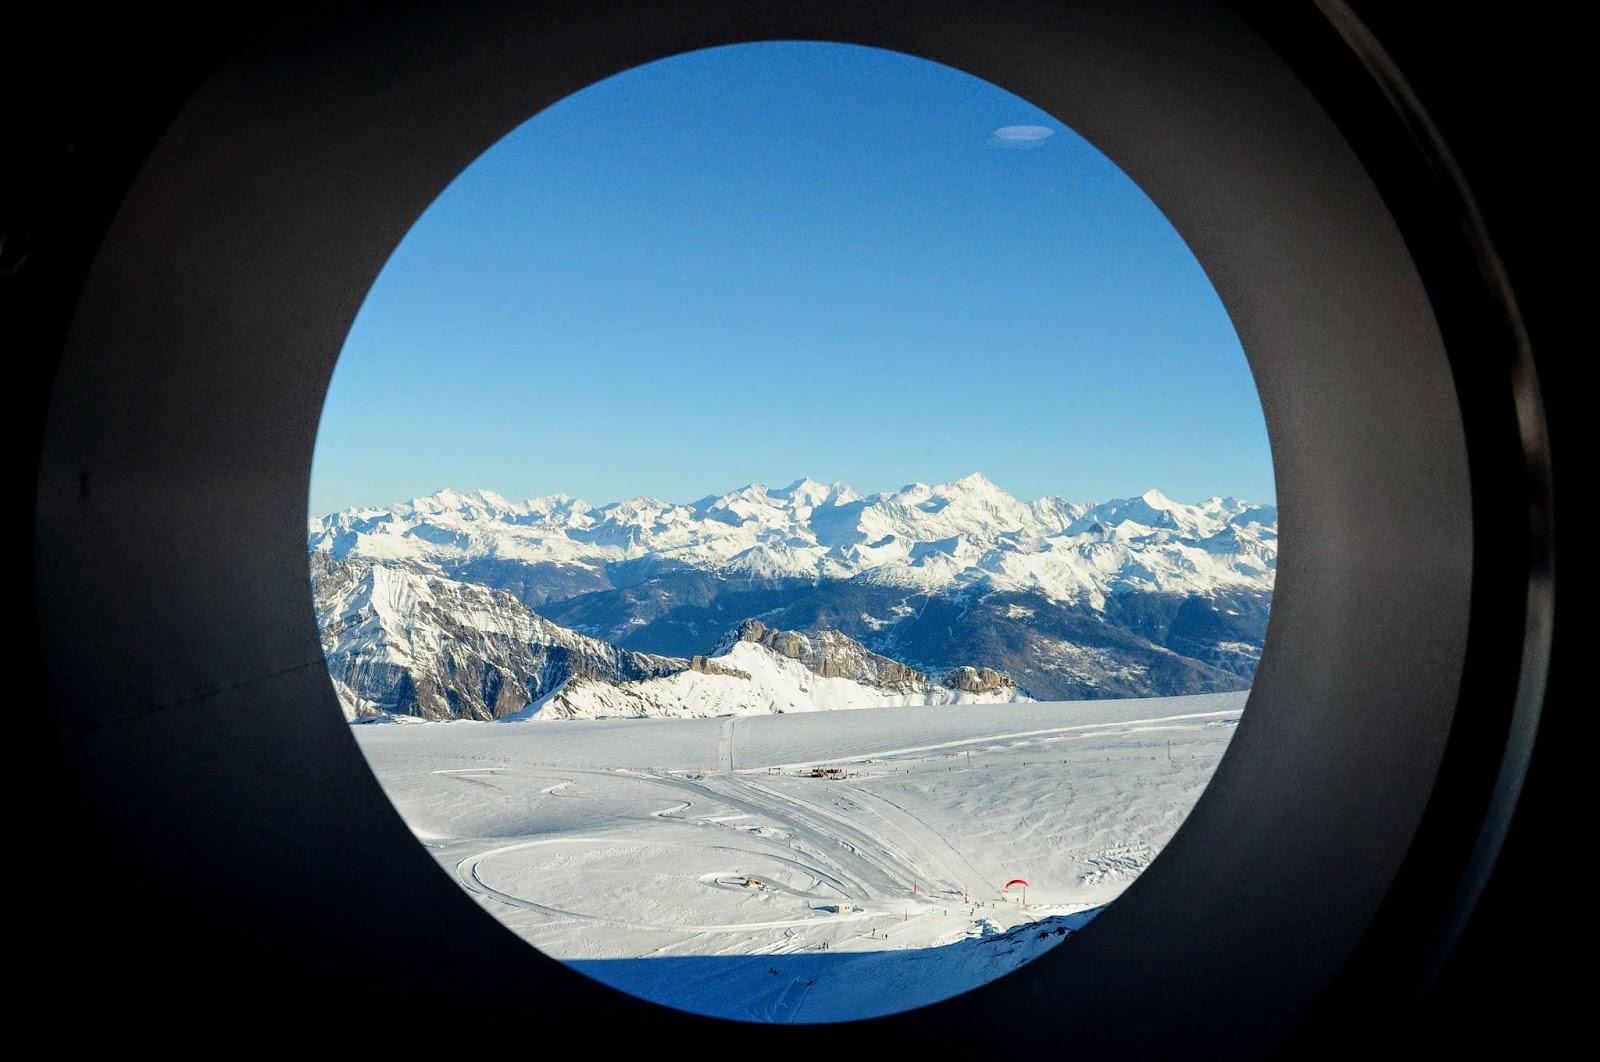 botta glacier 3000